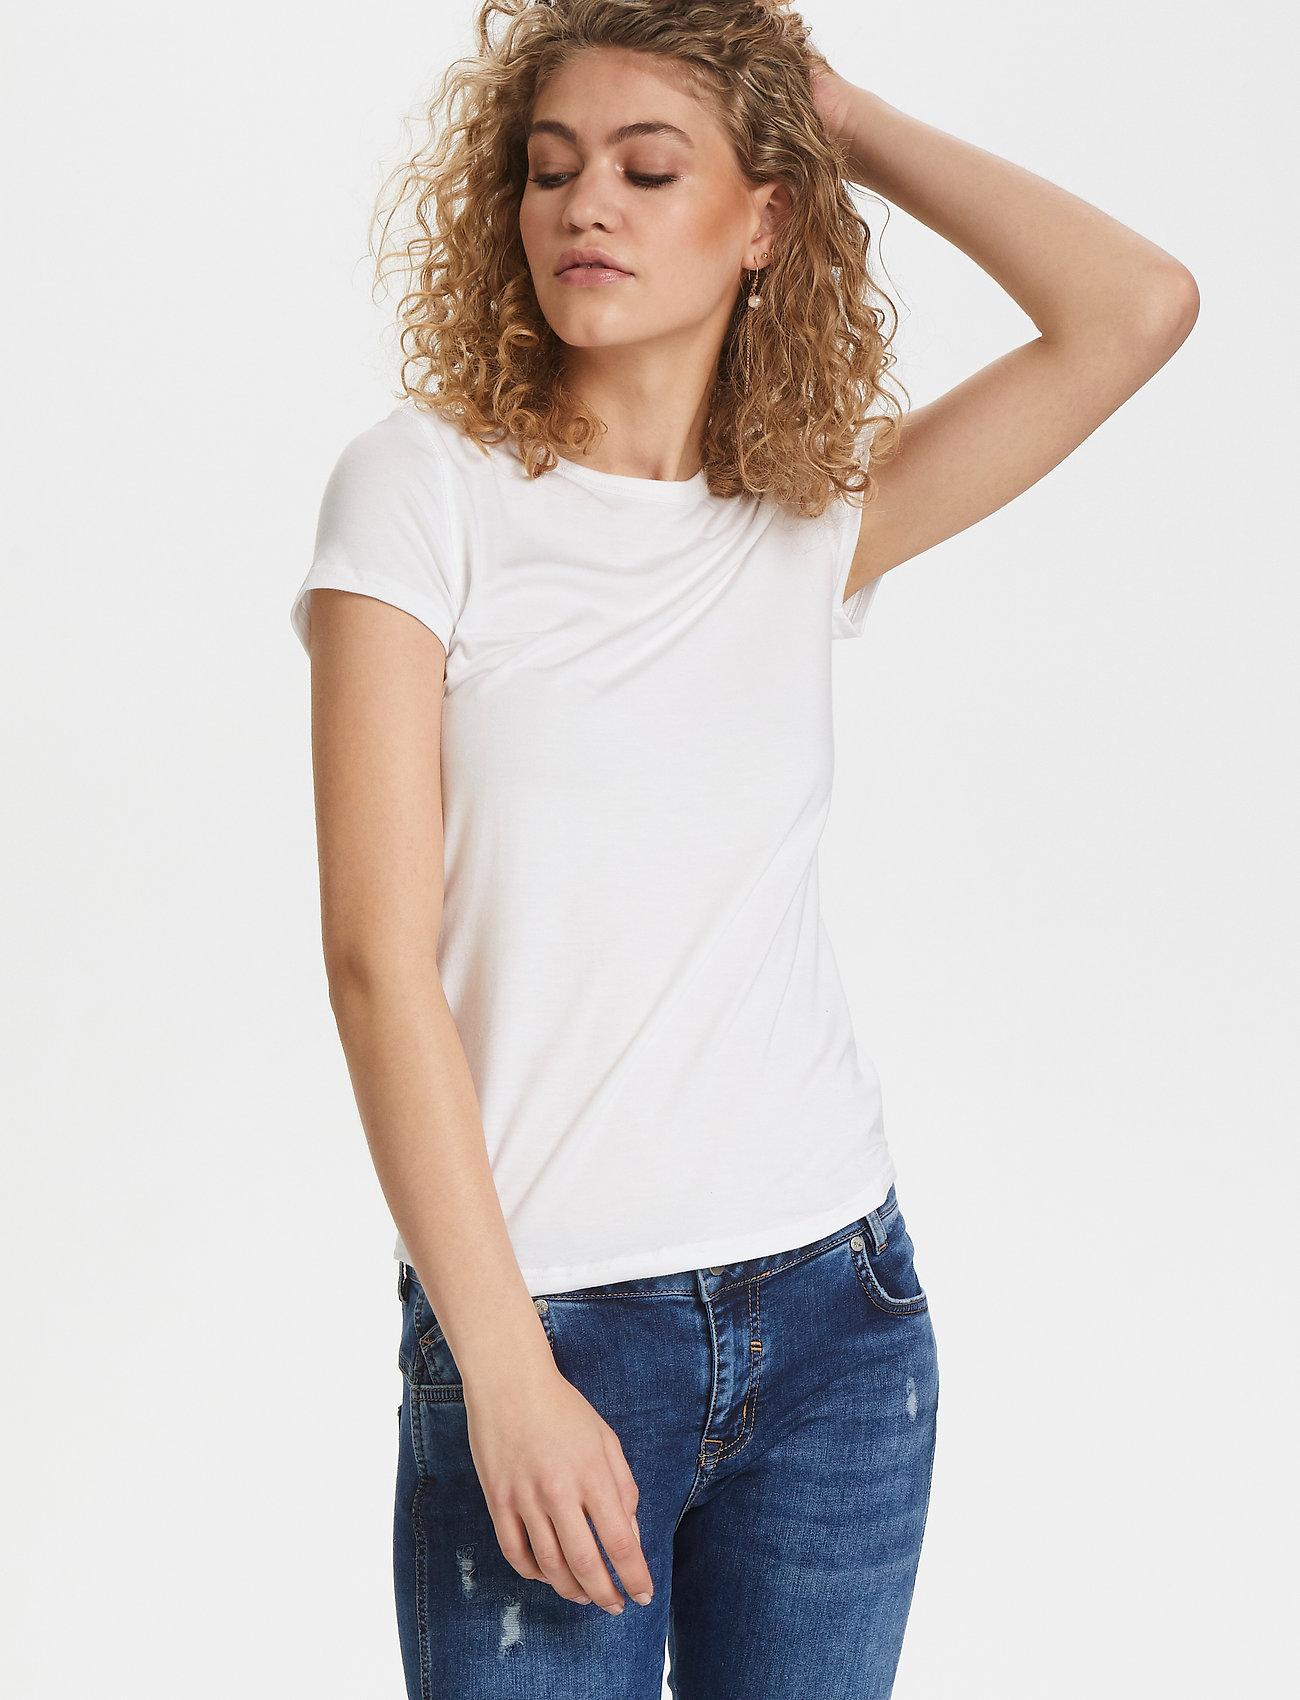 Denim Hunter - 16 THE MODAL TEE - t-shirts - optical white - 0